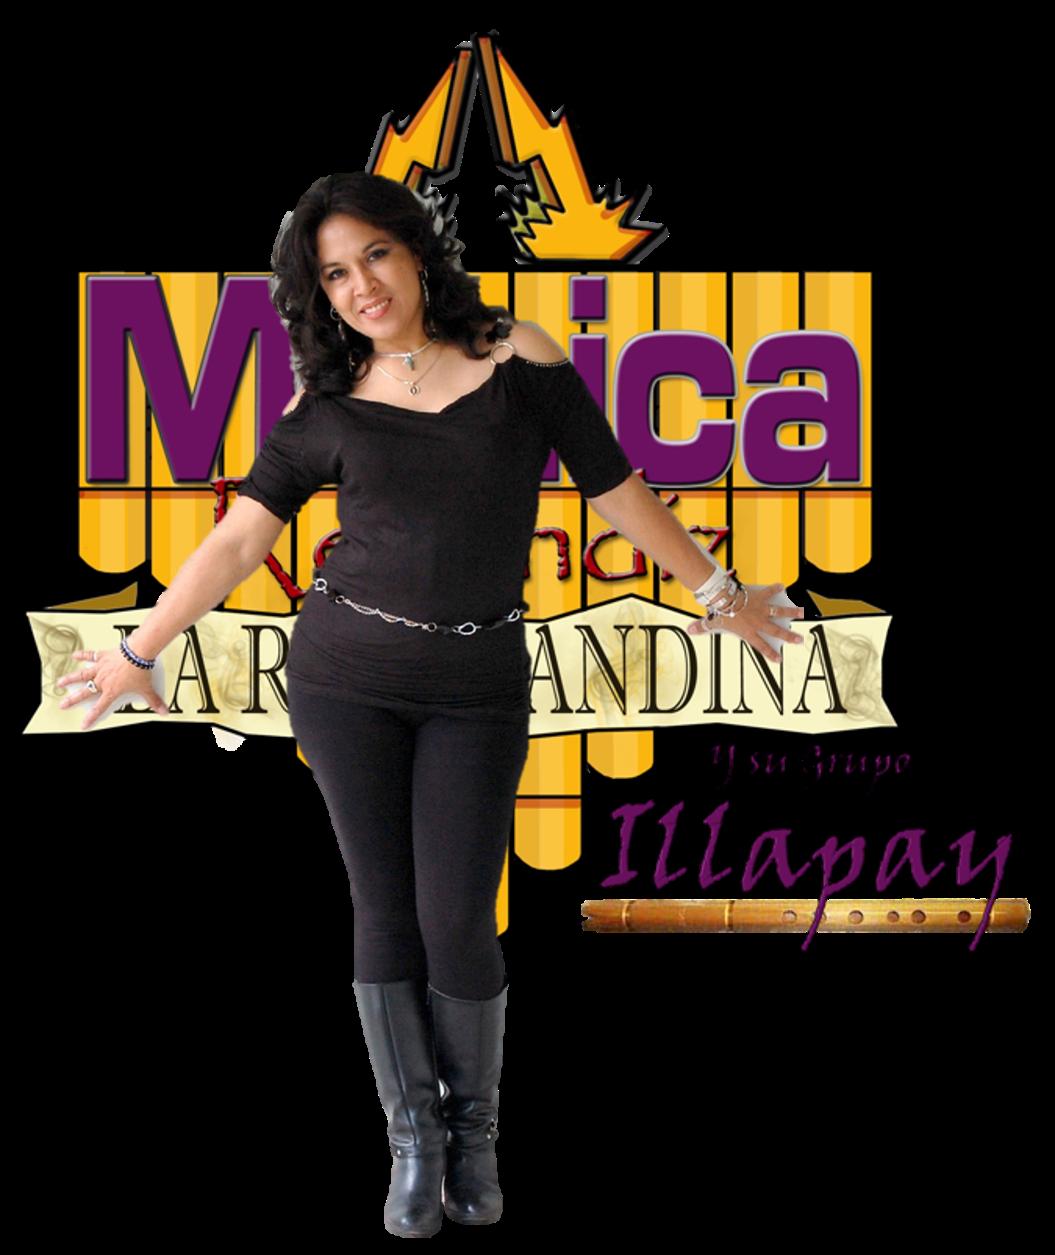 La Reina Andina Monica Resendiz